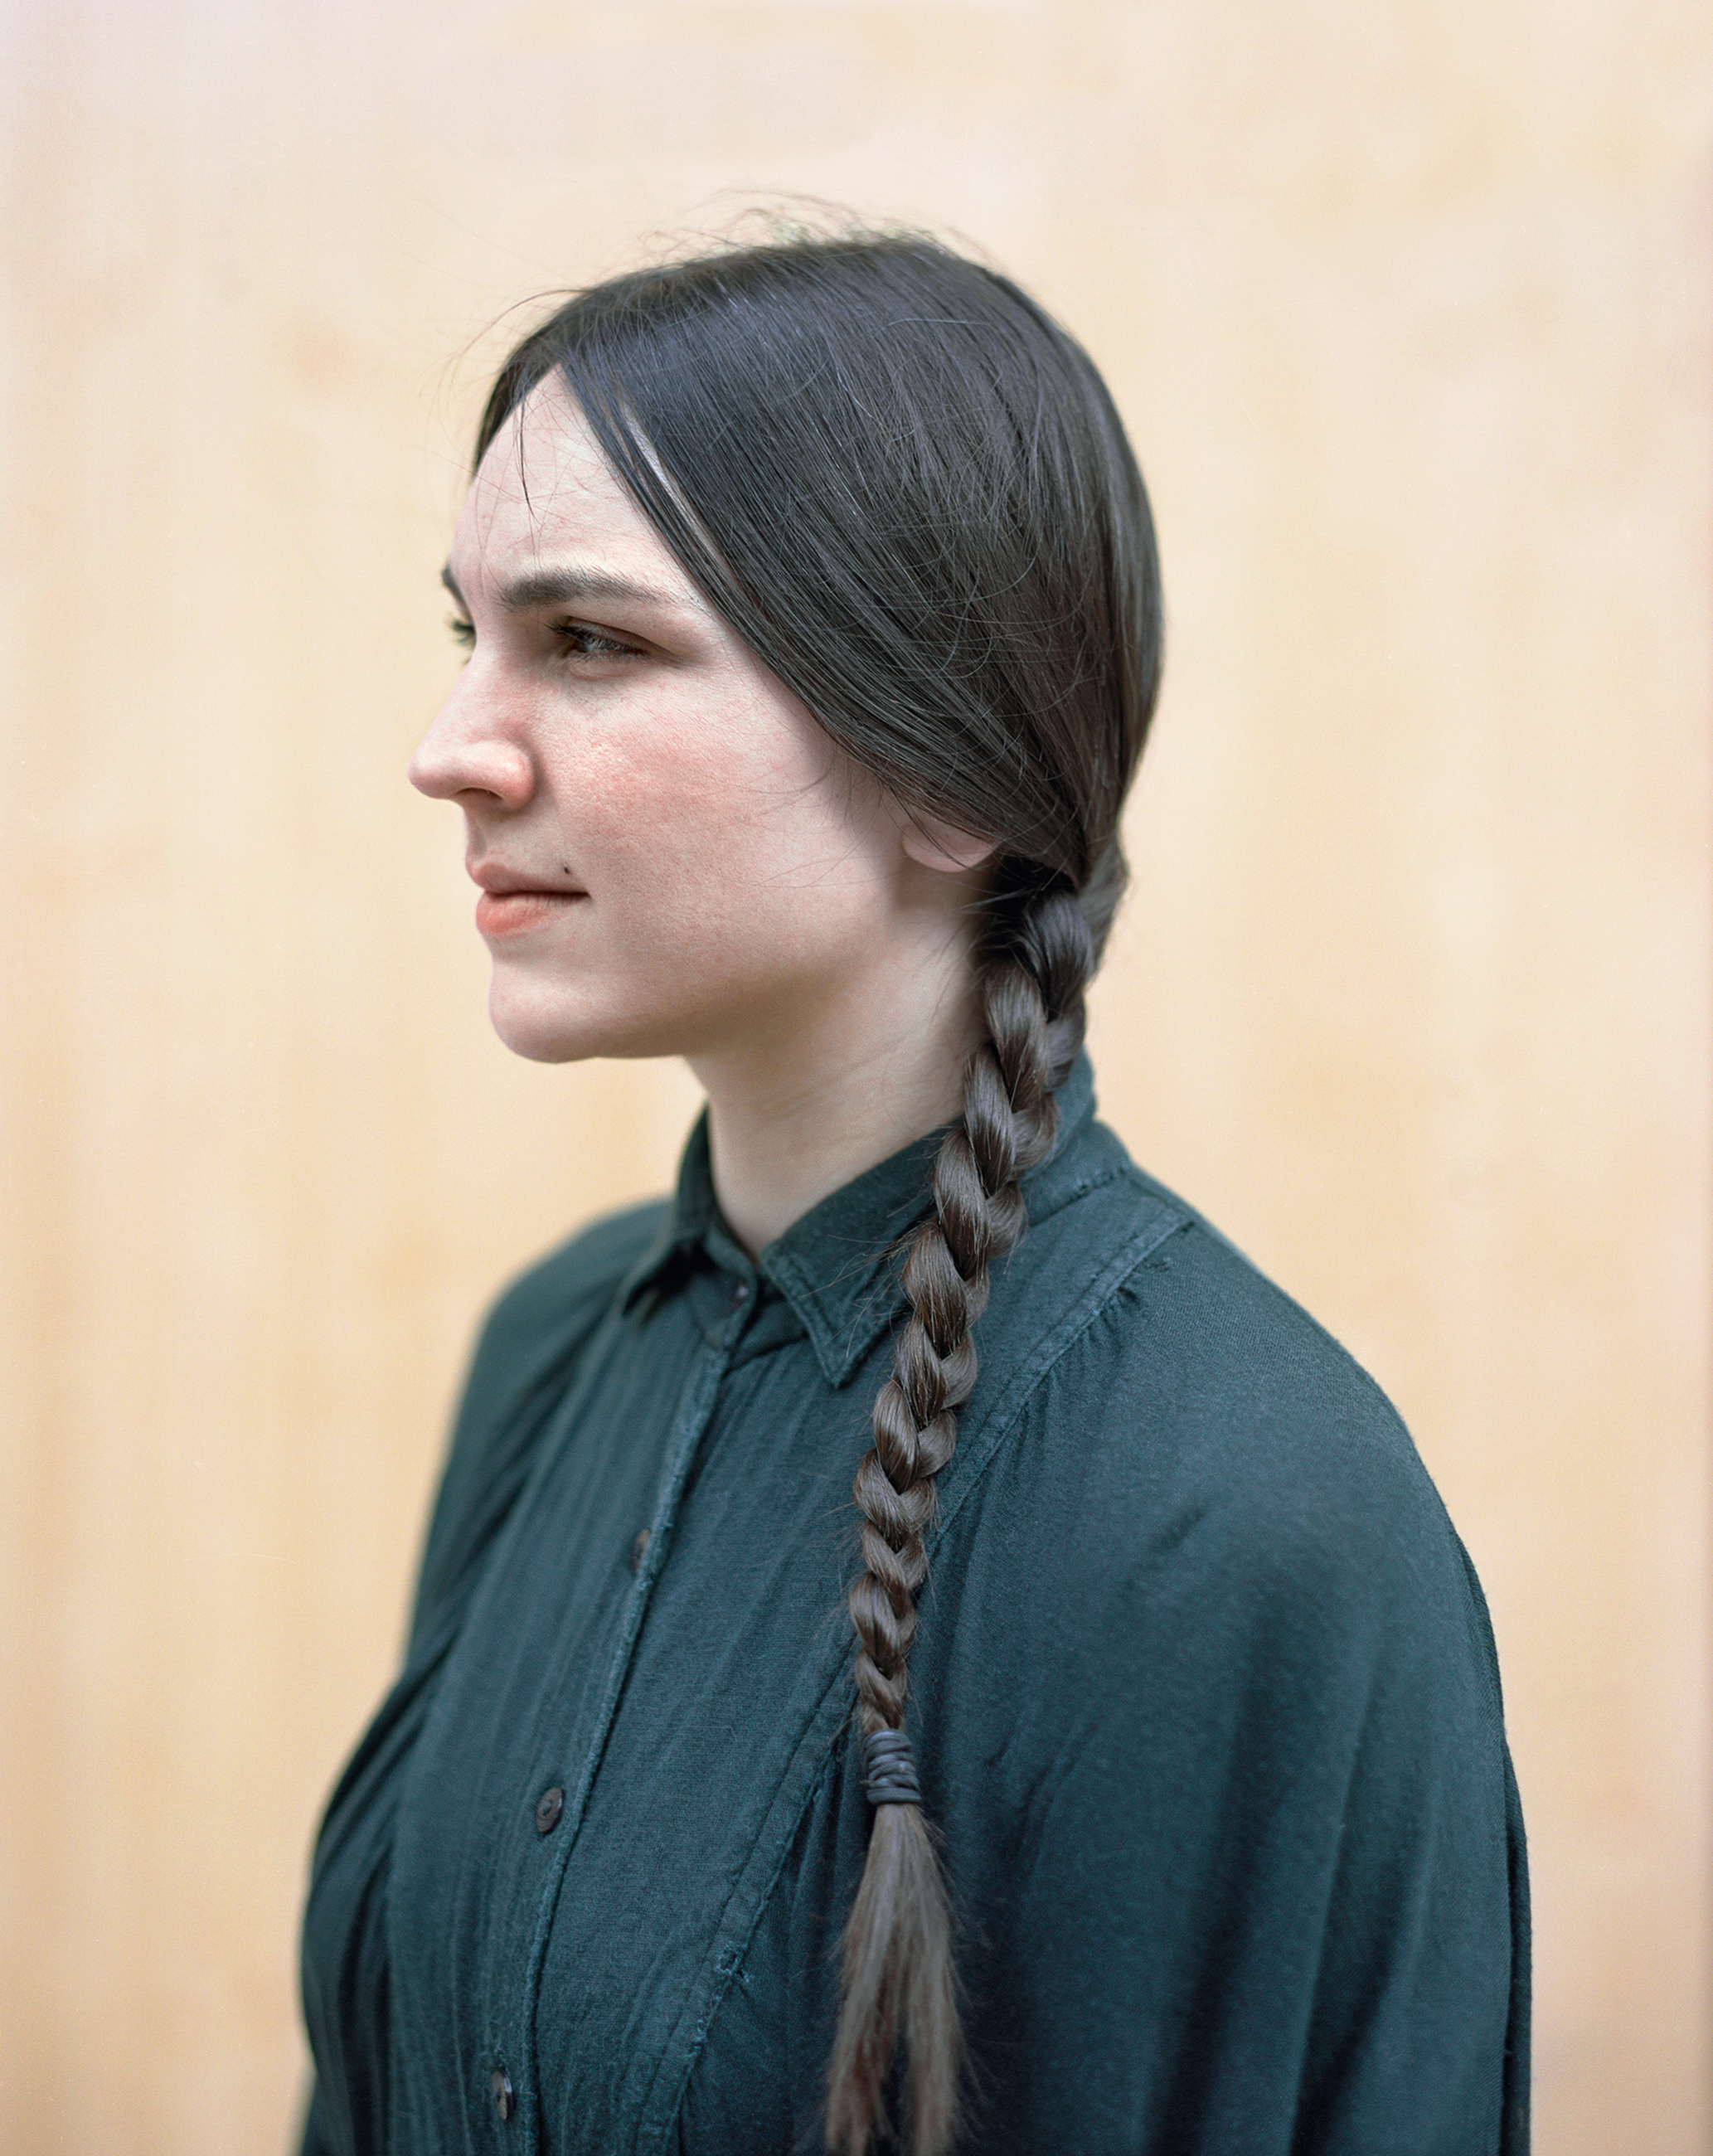 Clara Bahlsen, Töchter